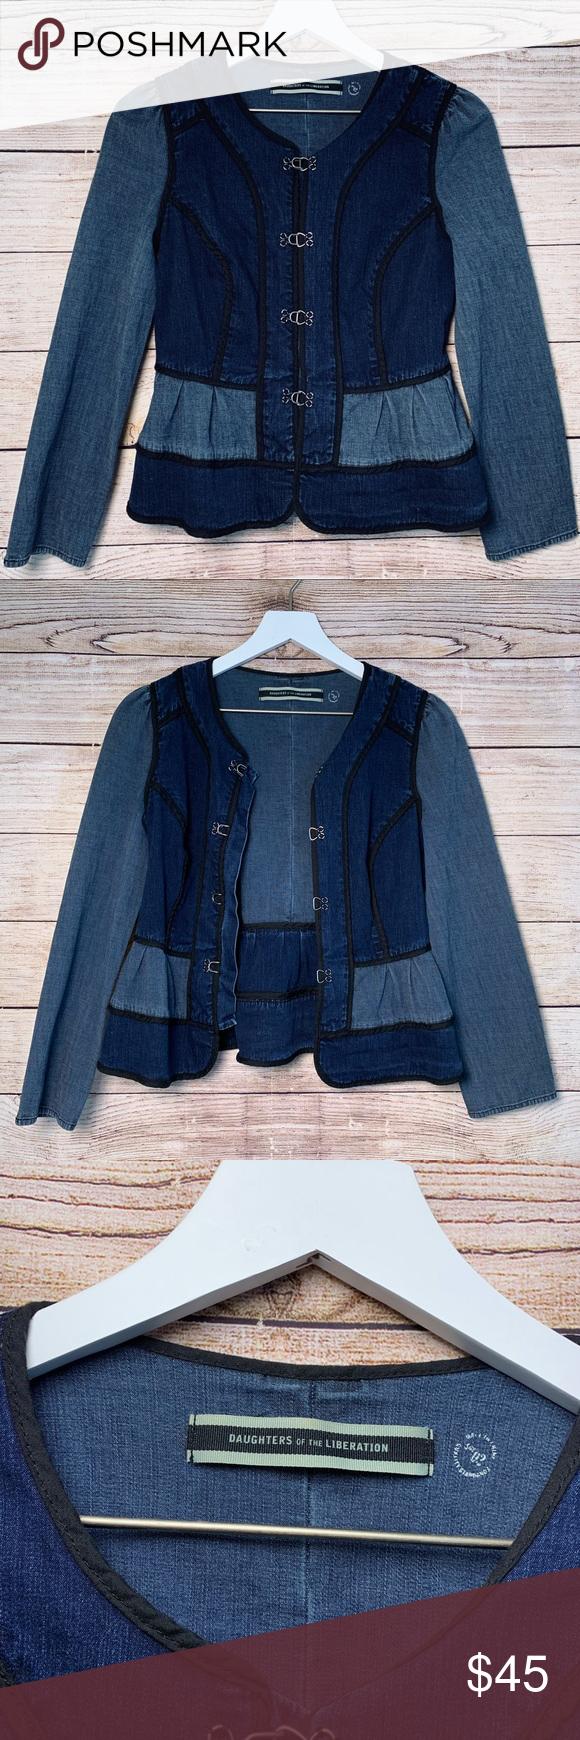 Anthro Daughters Of Liberation Peplum Denim Jacket Denim Jacket Clothes Design Anthropologie Jacket [ 1740 x 580 Pixel ]